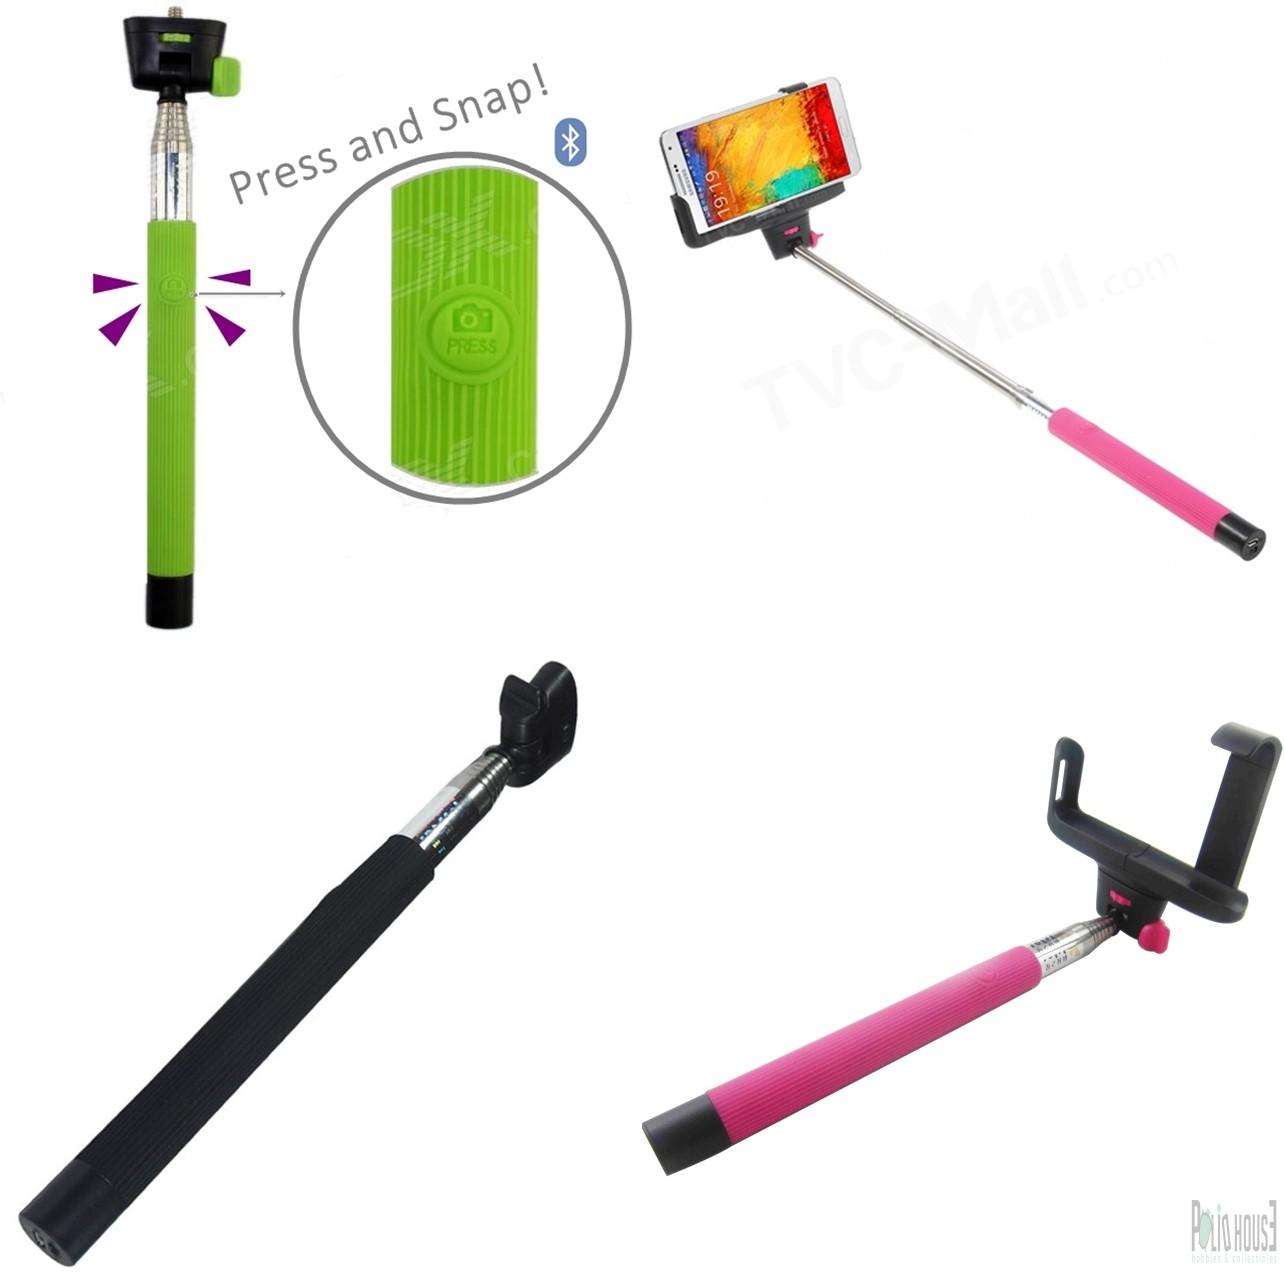 Monopod Bluetooth Z07 05 For Android Tongsis Hijau5 Daftar Harga Wireless Spesifikasi Handphone Pink Terbaru Ios Holder L